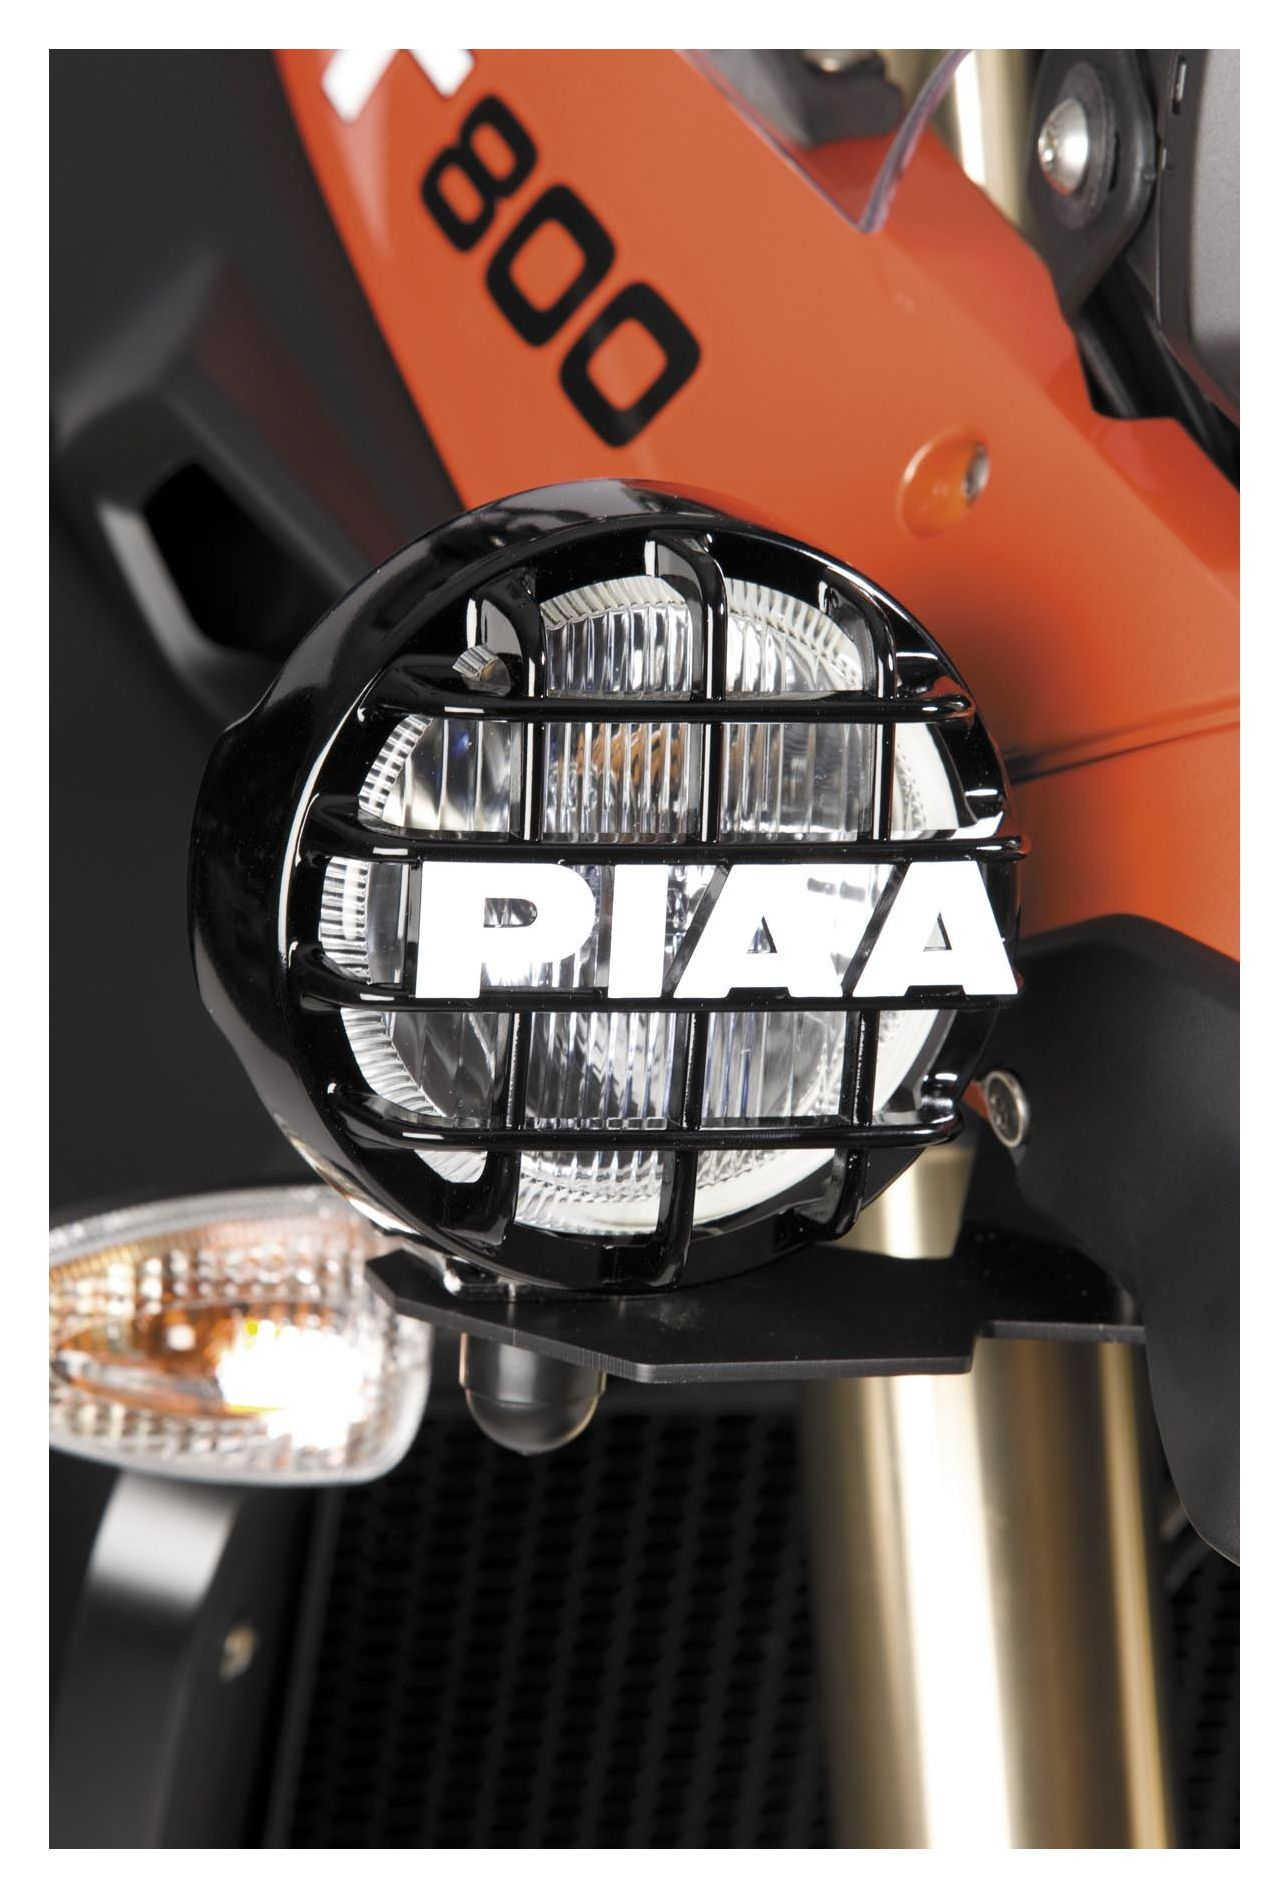 piaa atp driving light kit mounting brackets bmw fgs piaa 510 atp driving light kit mounting brackets bmw f650gs f800gs 2008 2011 revzilla